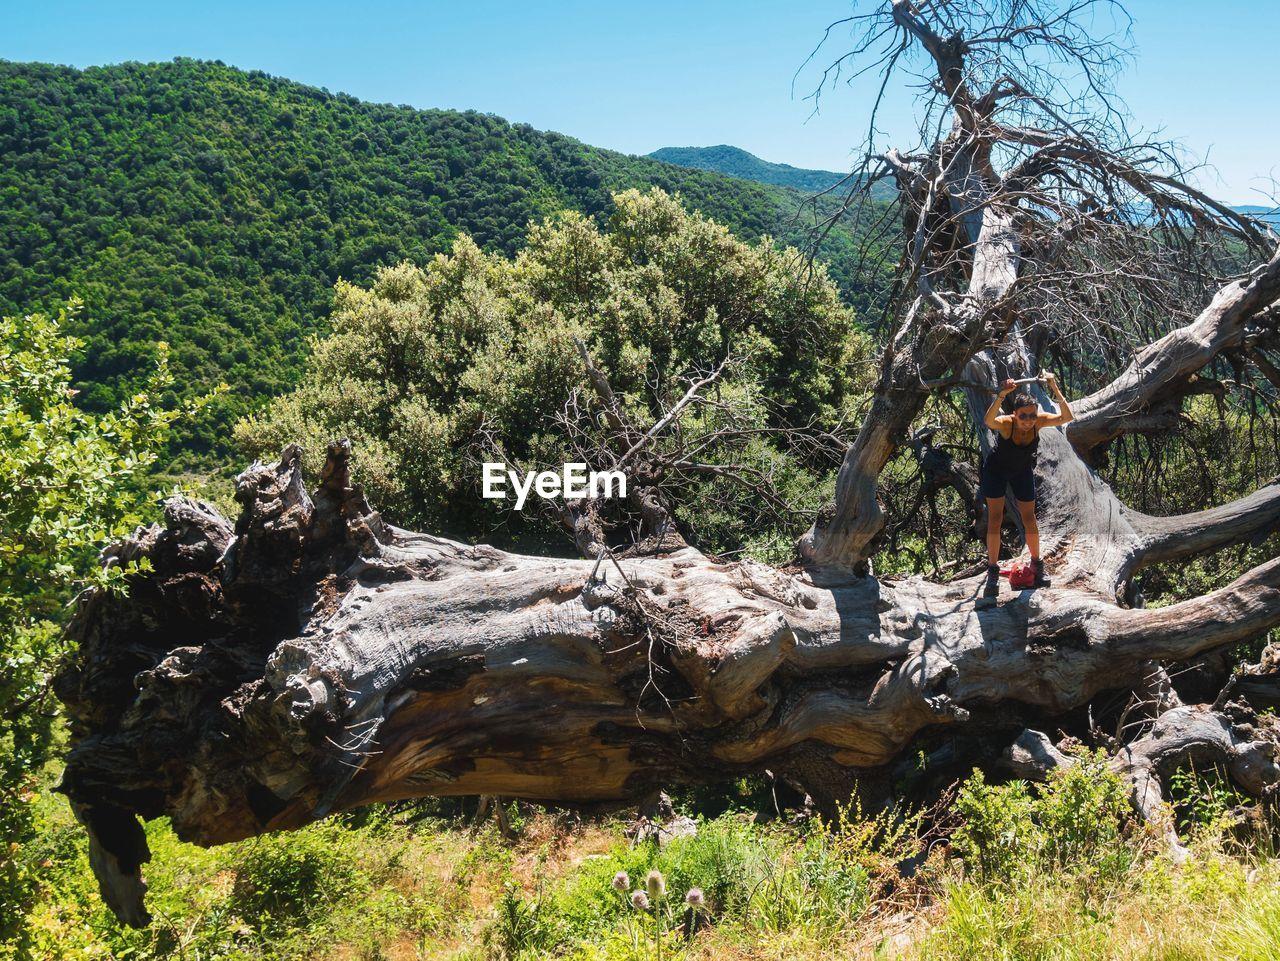 TREES ON LOG AGAINST TREE MOUNTAINS